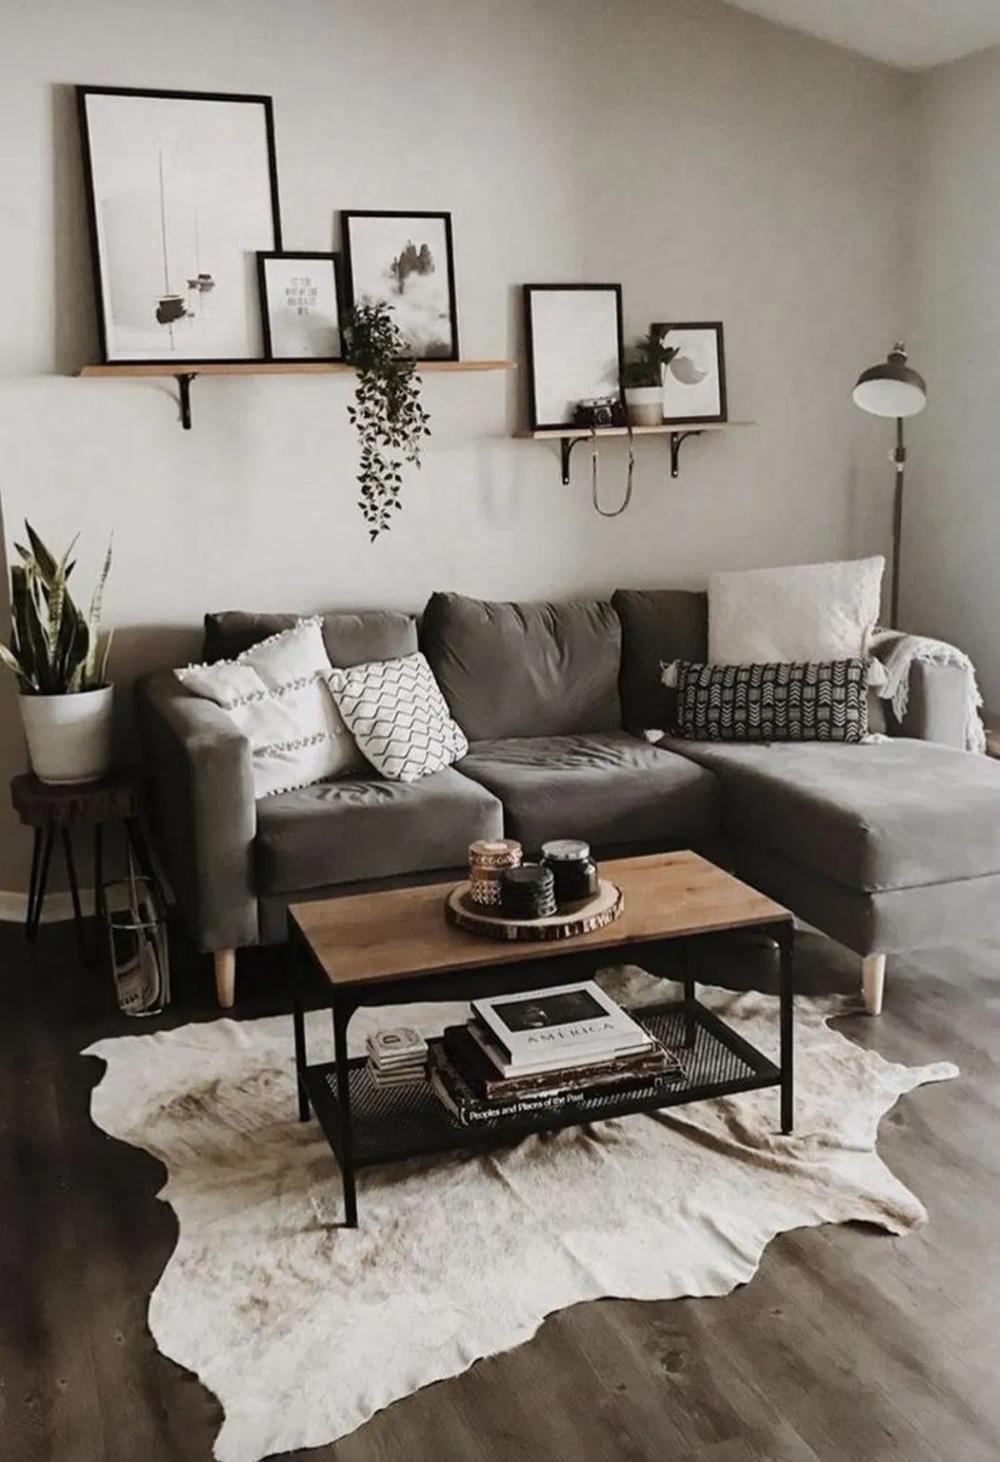 50 Minimalist Decorating Ideas For Amaze Living Room Design 2020 34 In 2020 Living Room Decor Modern Living Room Designs Living Room Grey